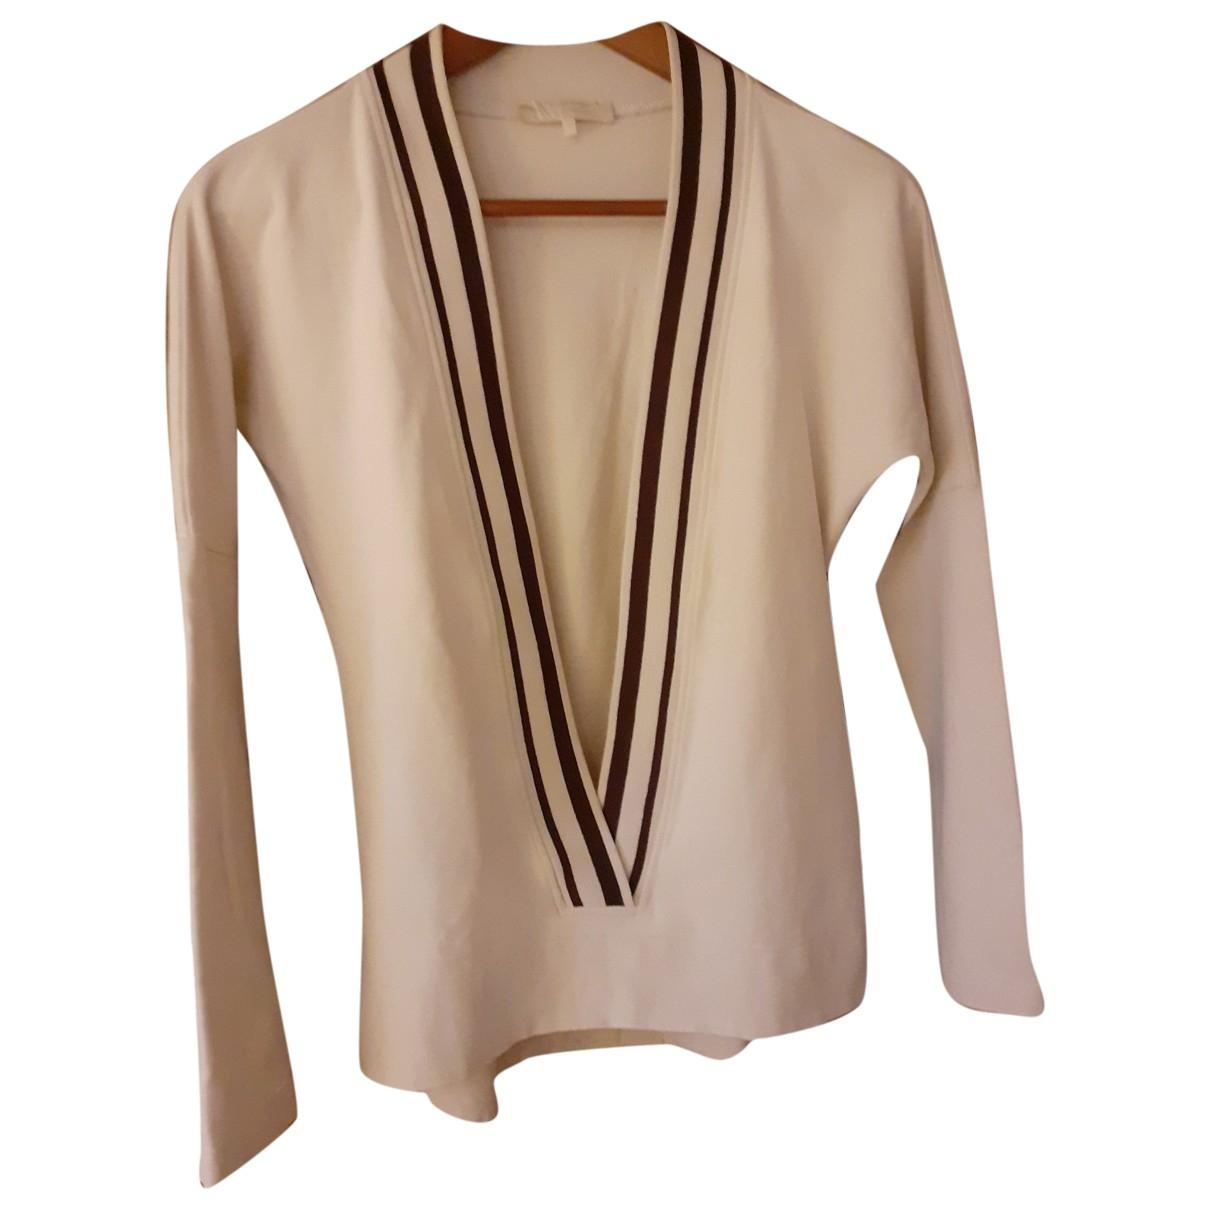 Max Mara 's \N Ecru Cotton Knitwear for Women M International